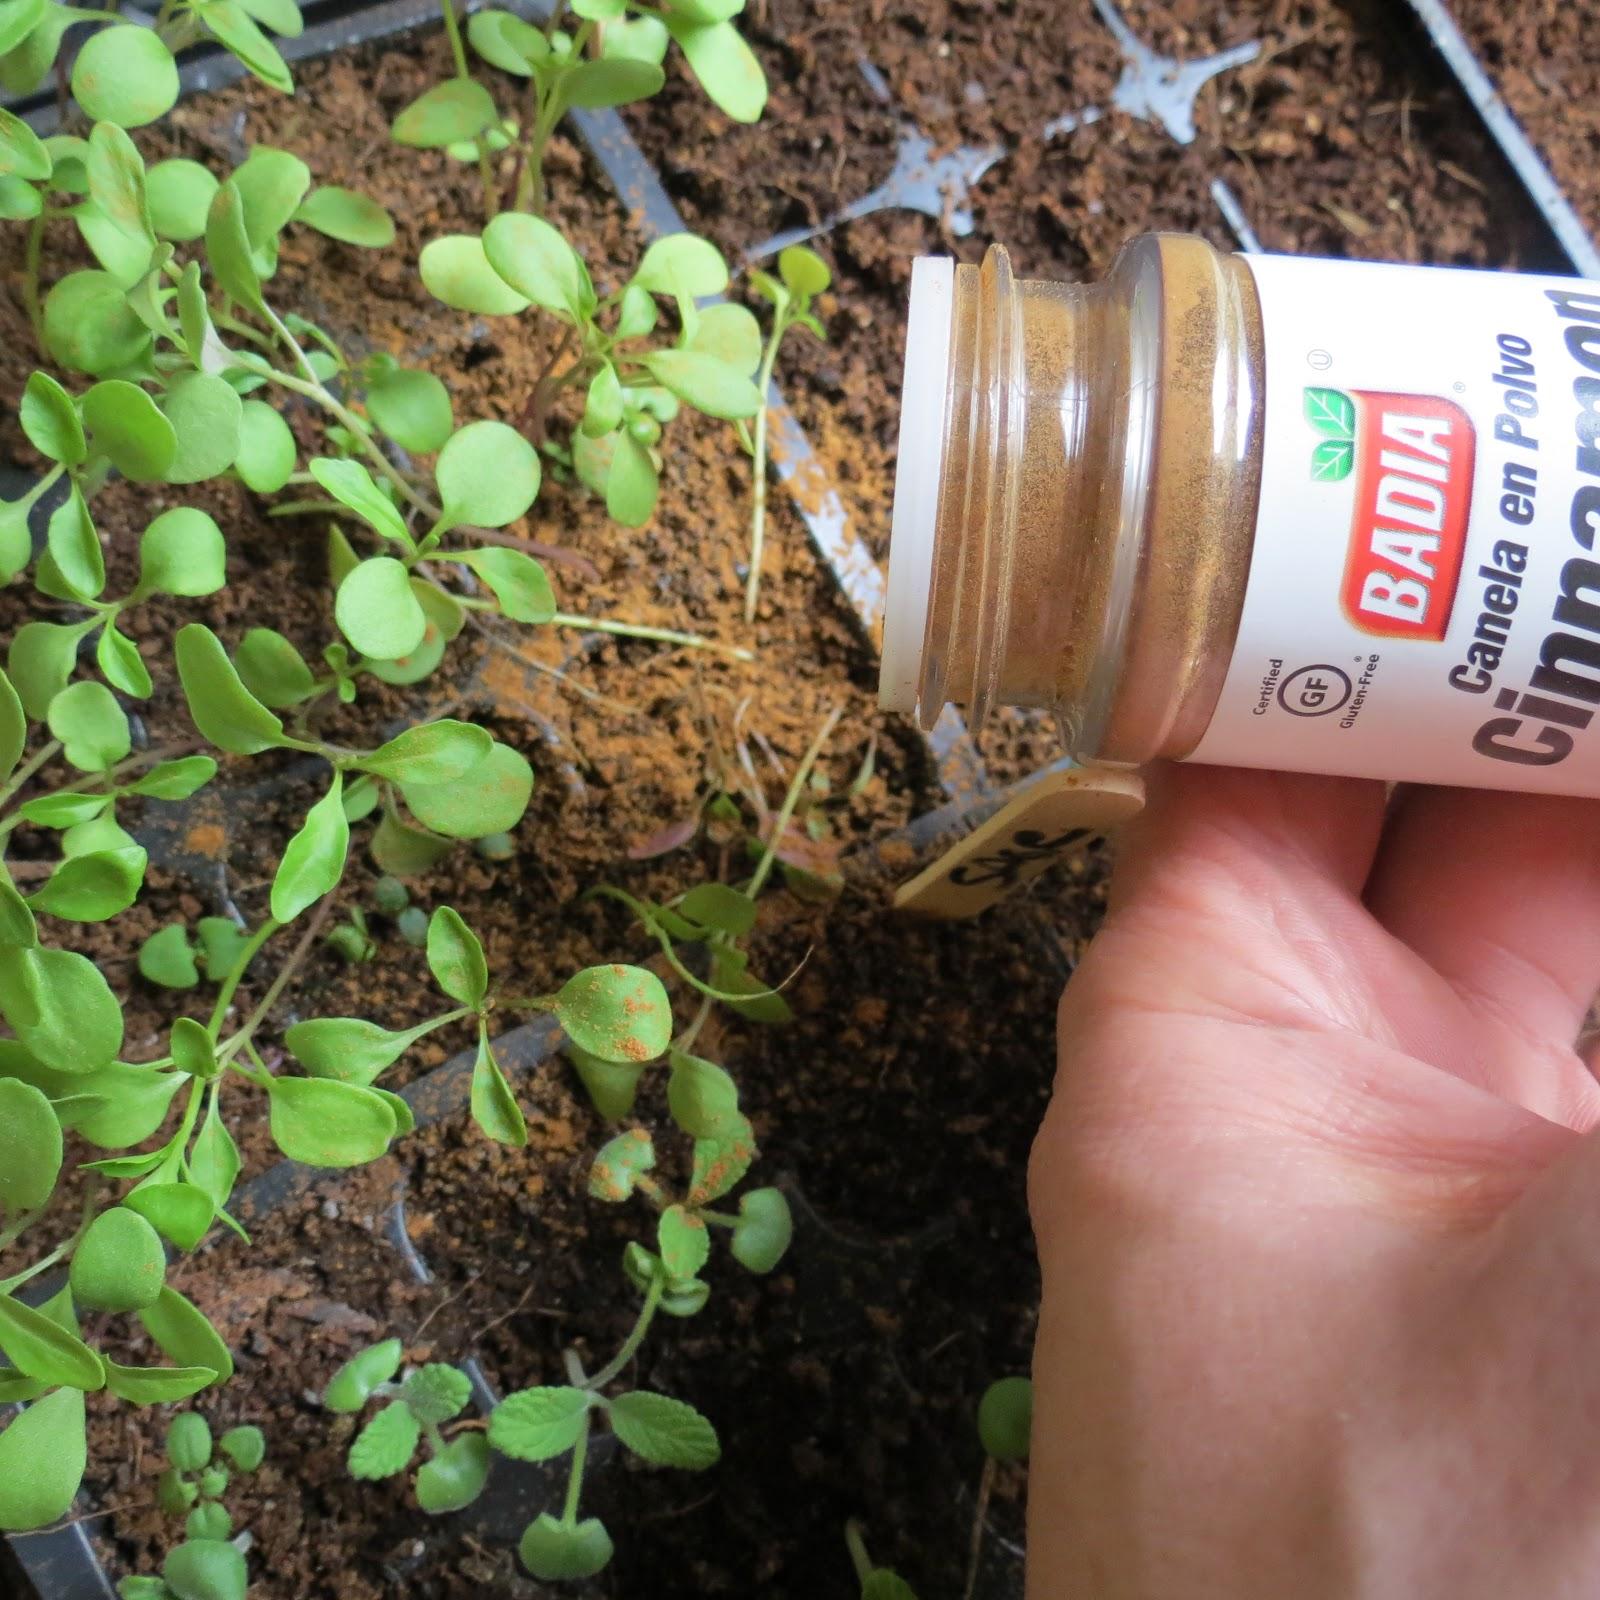 pielęgnacja roślin - cynamon